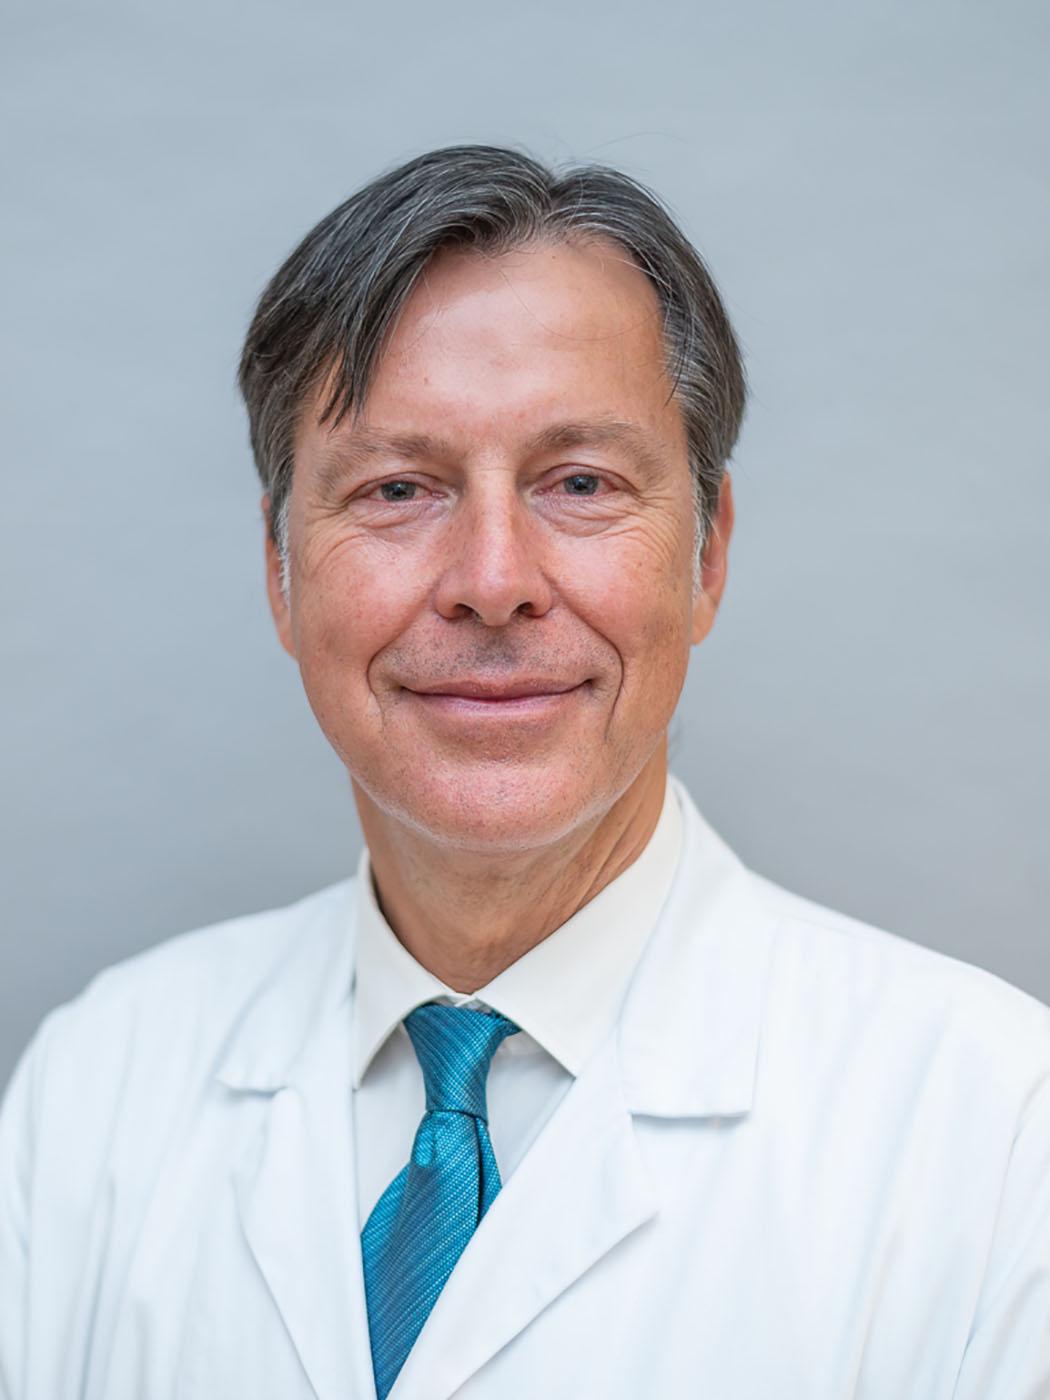 Univ. Doz. Dr. Martin Grabenwöger